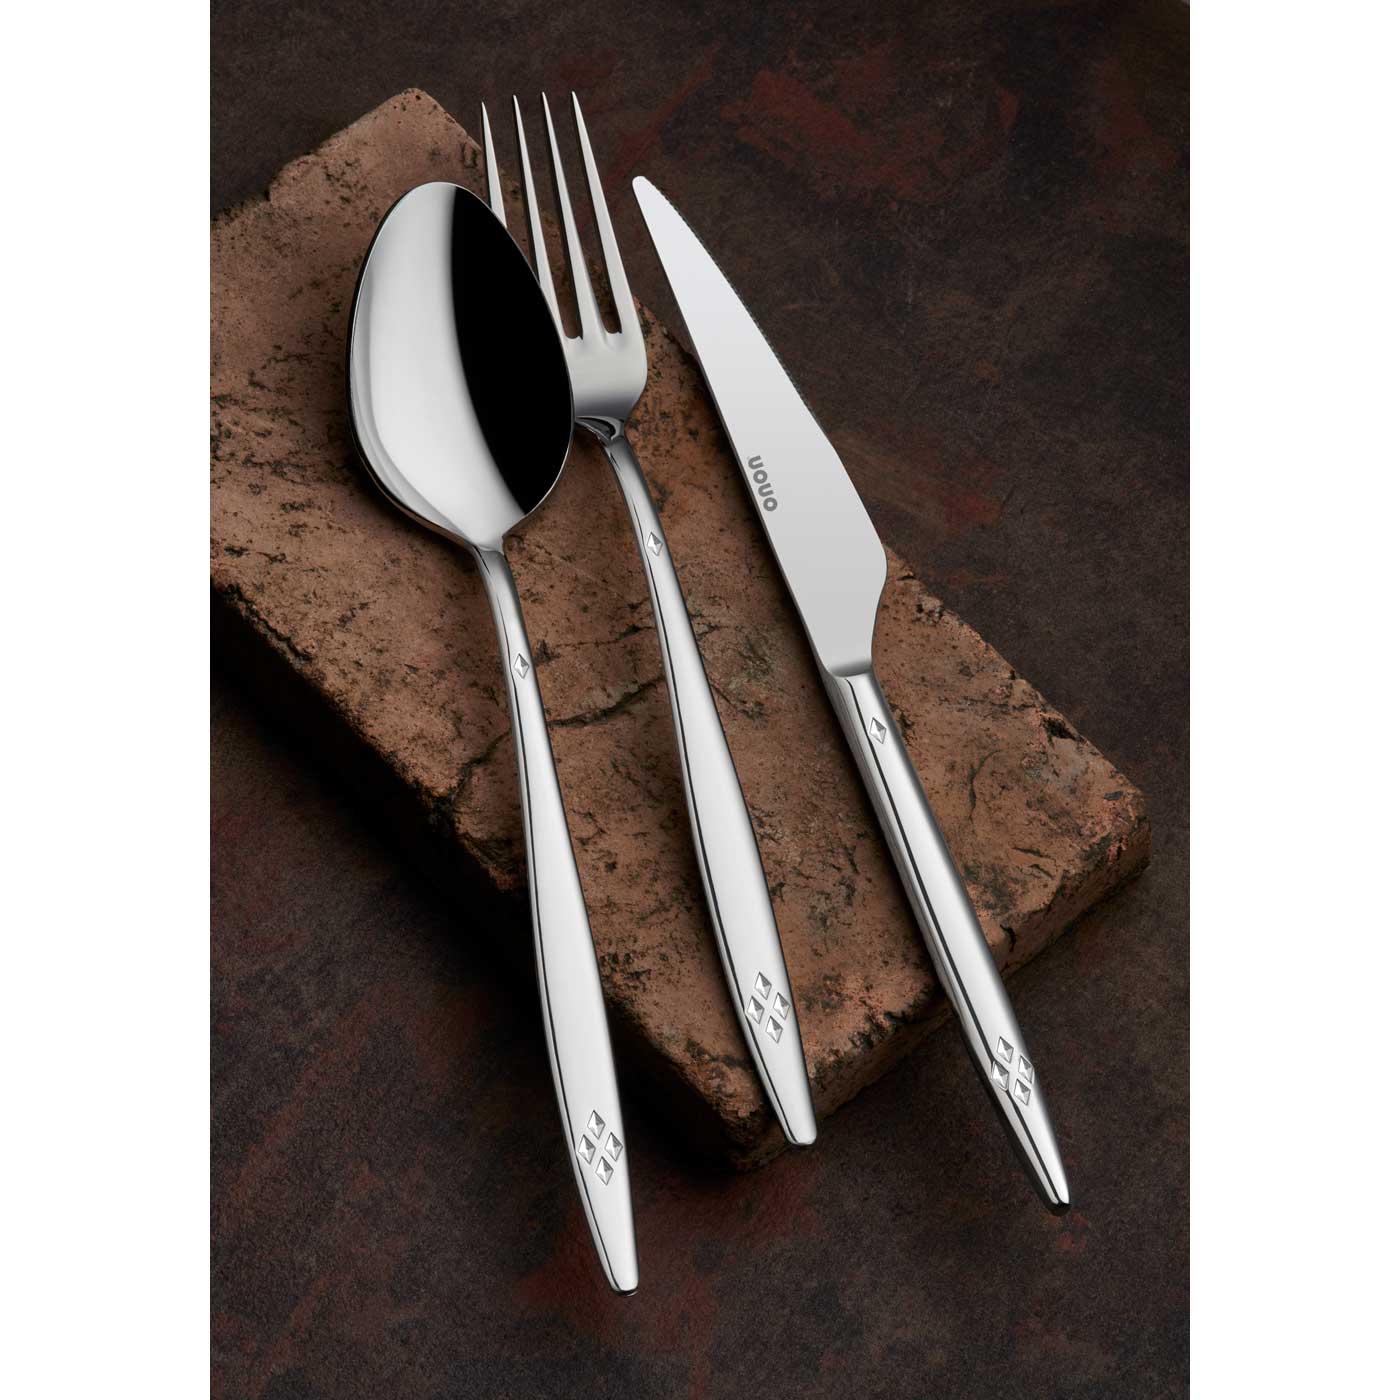 ONON Mira Sade 12 Adet Yemek Bıçağı 2